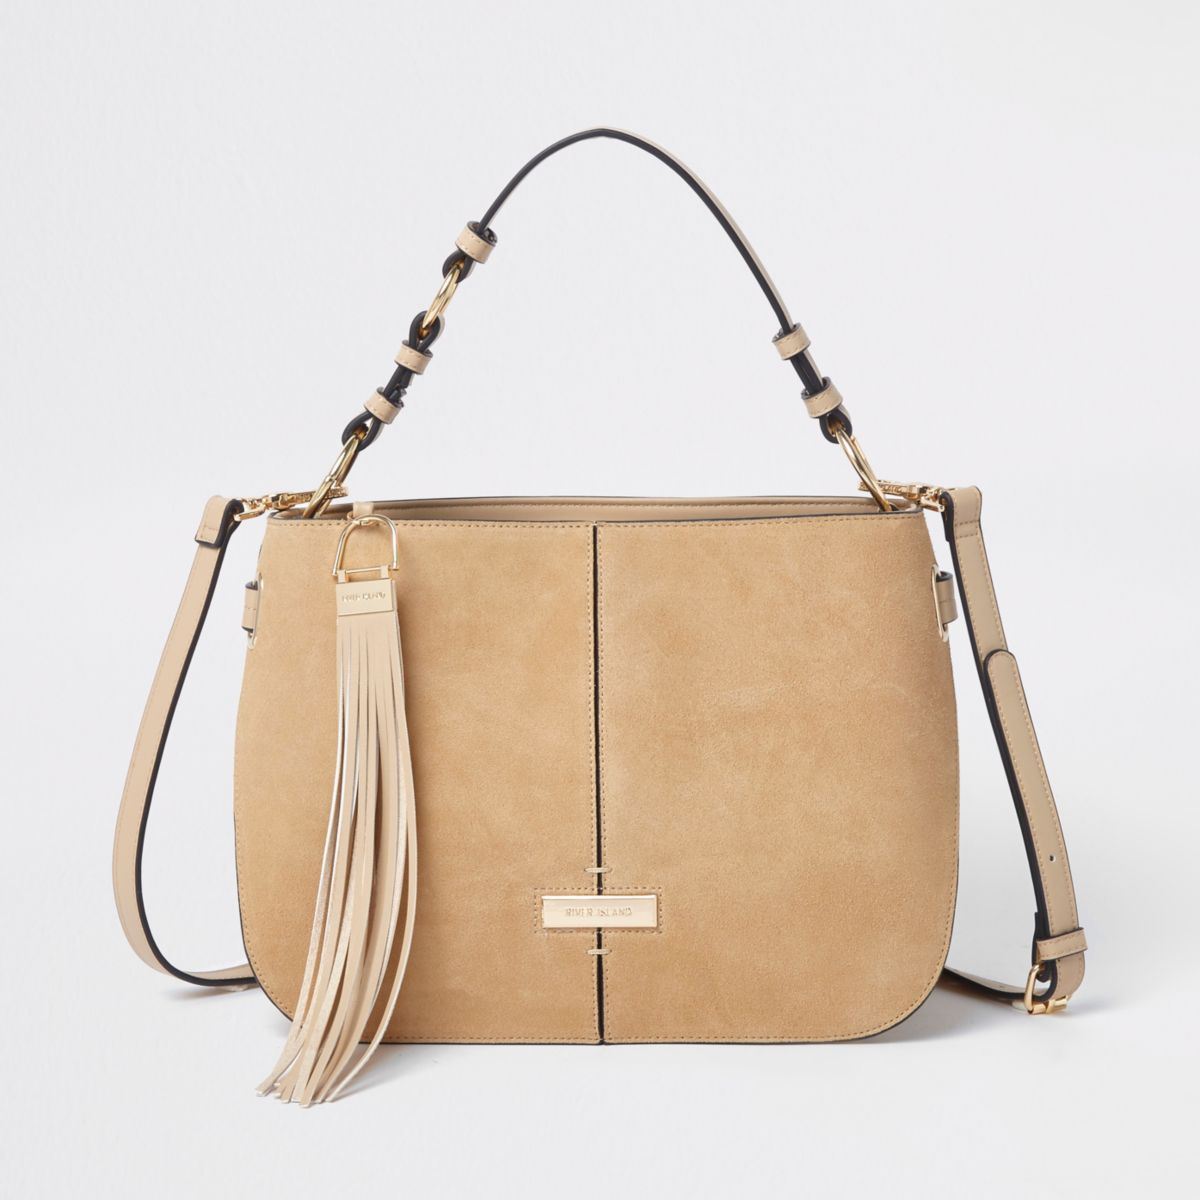 Cream suede tassel leather cross body bag